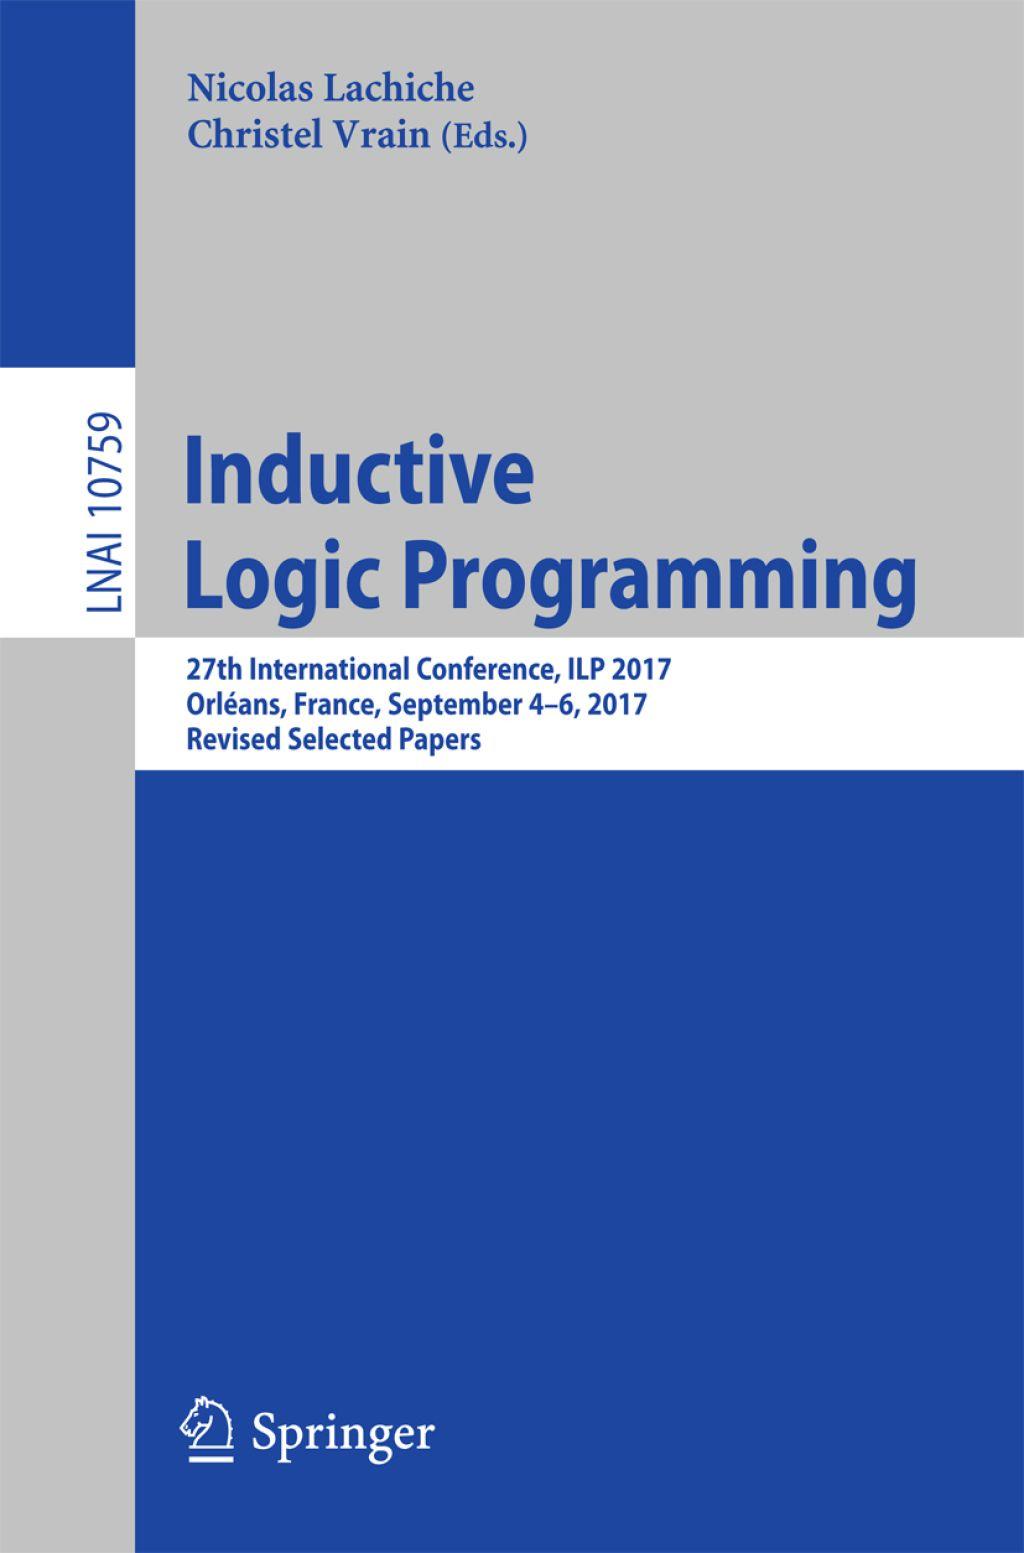 Inductive Logic Programming Ebook Artificial Intelligence